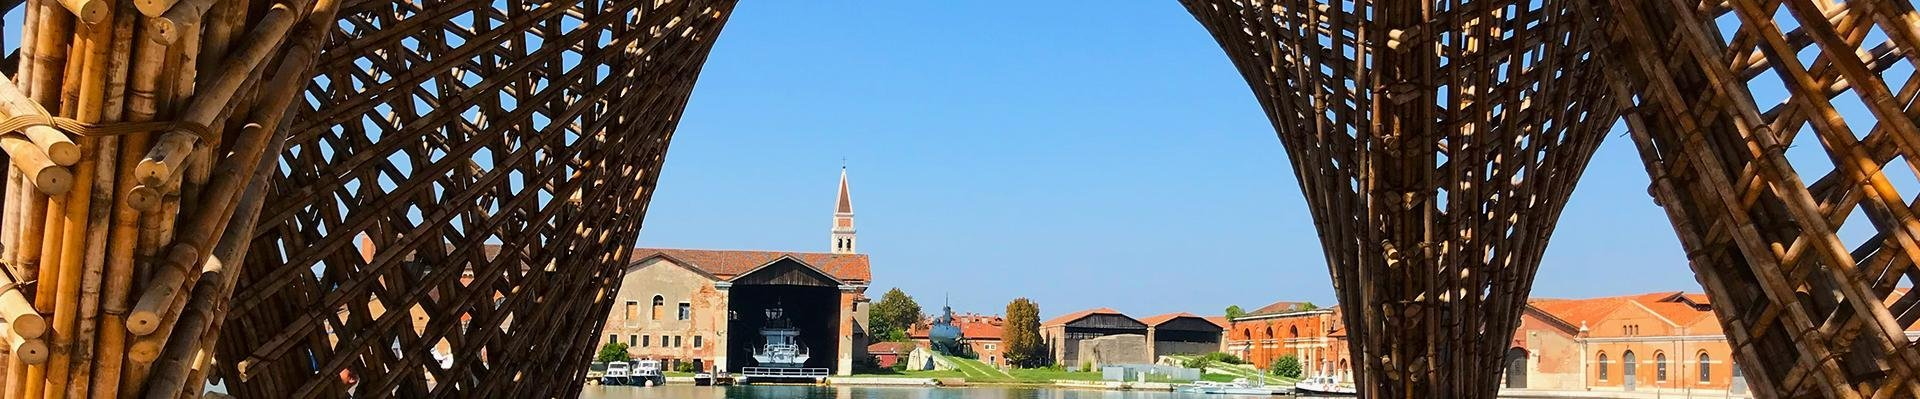 Architectuurbiënnale Venetië